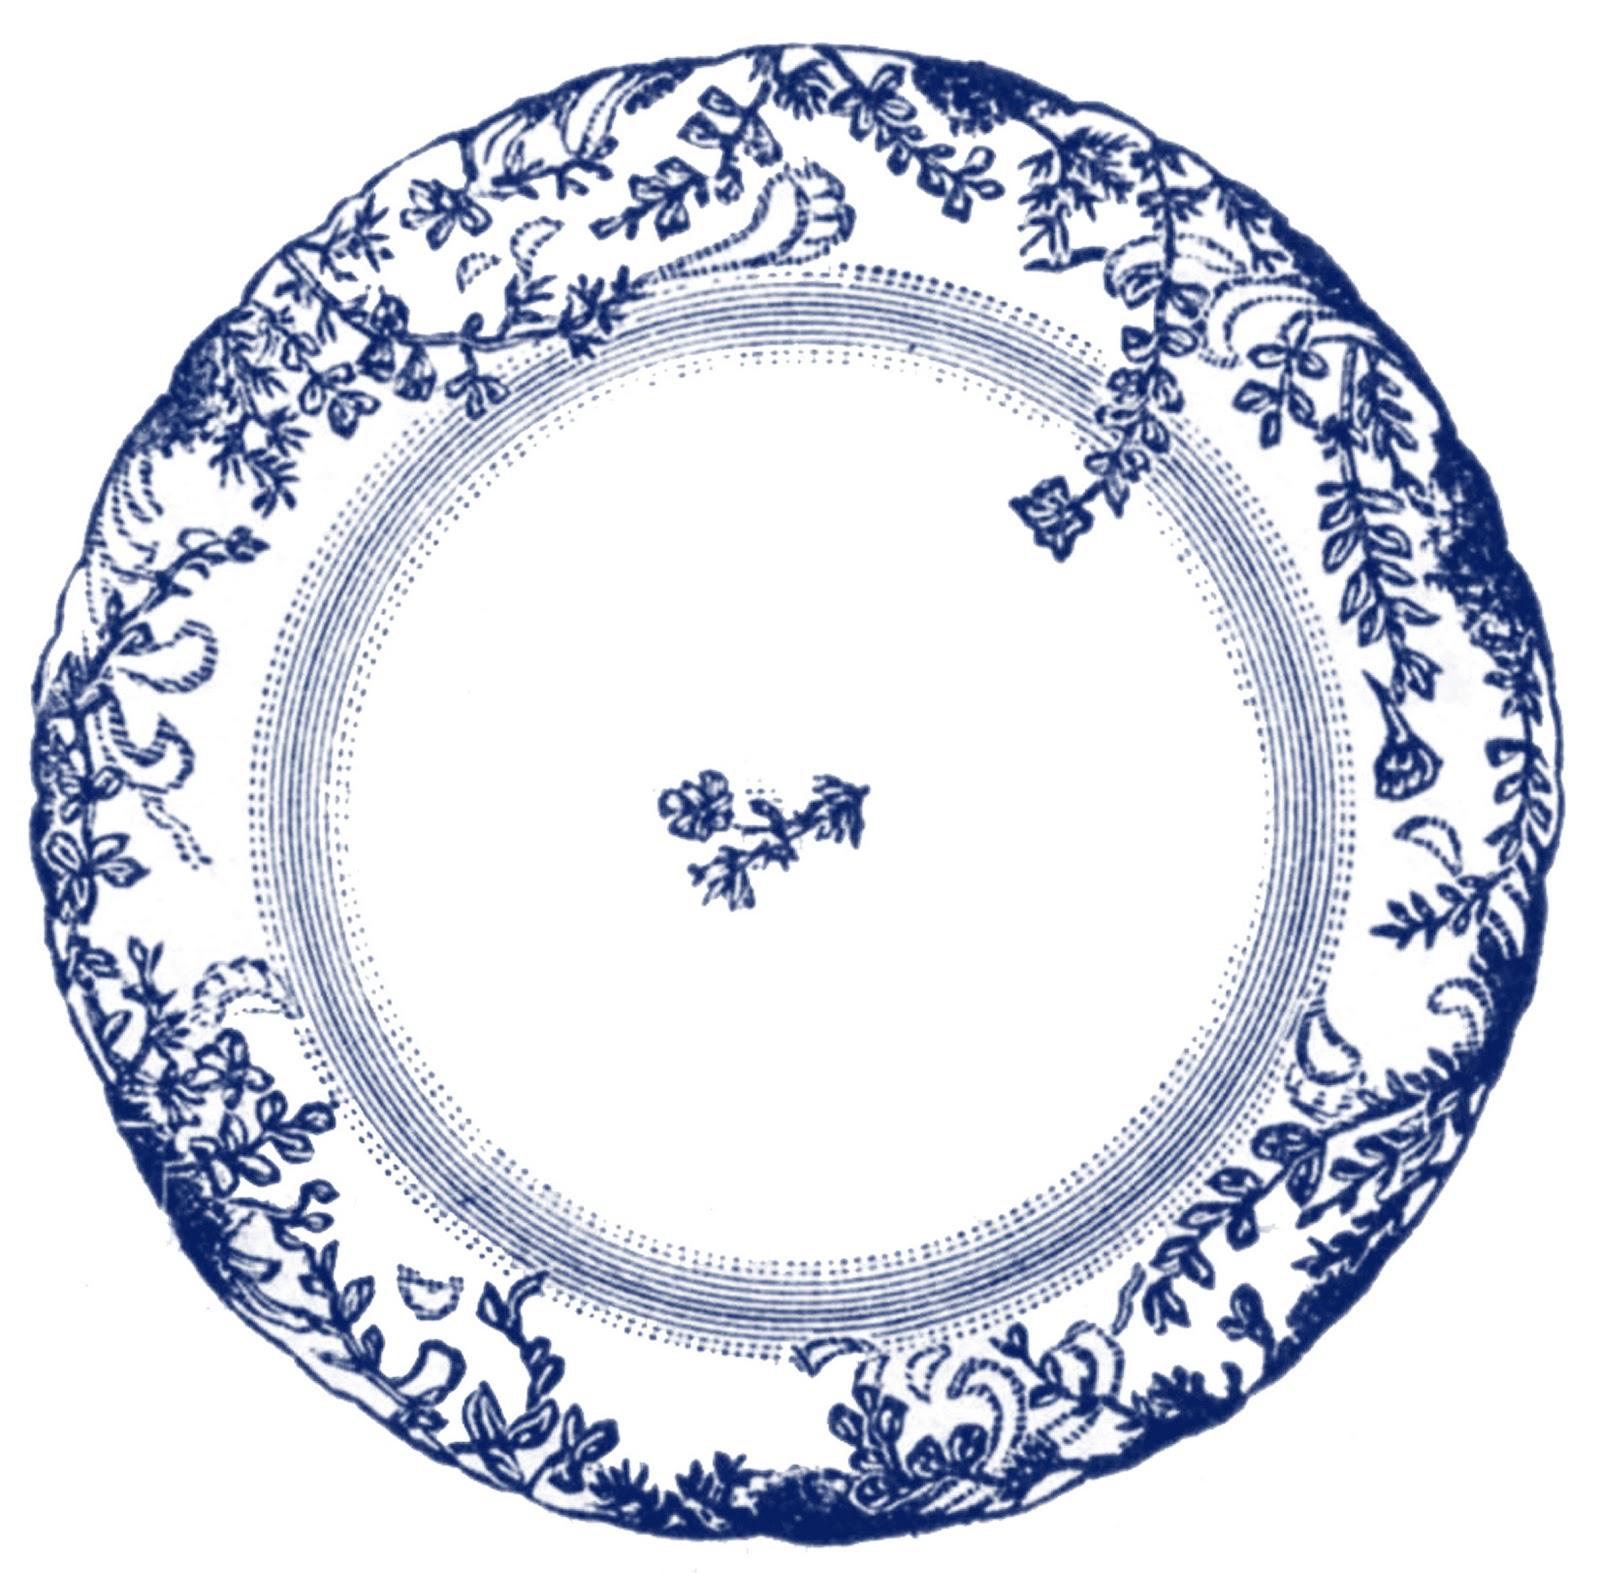 Vintage Clip Art Antique China Plate